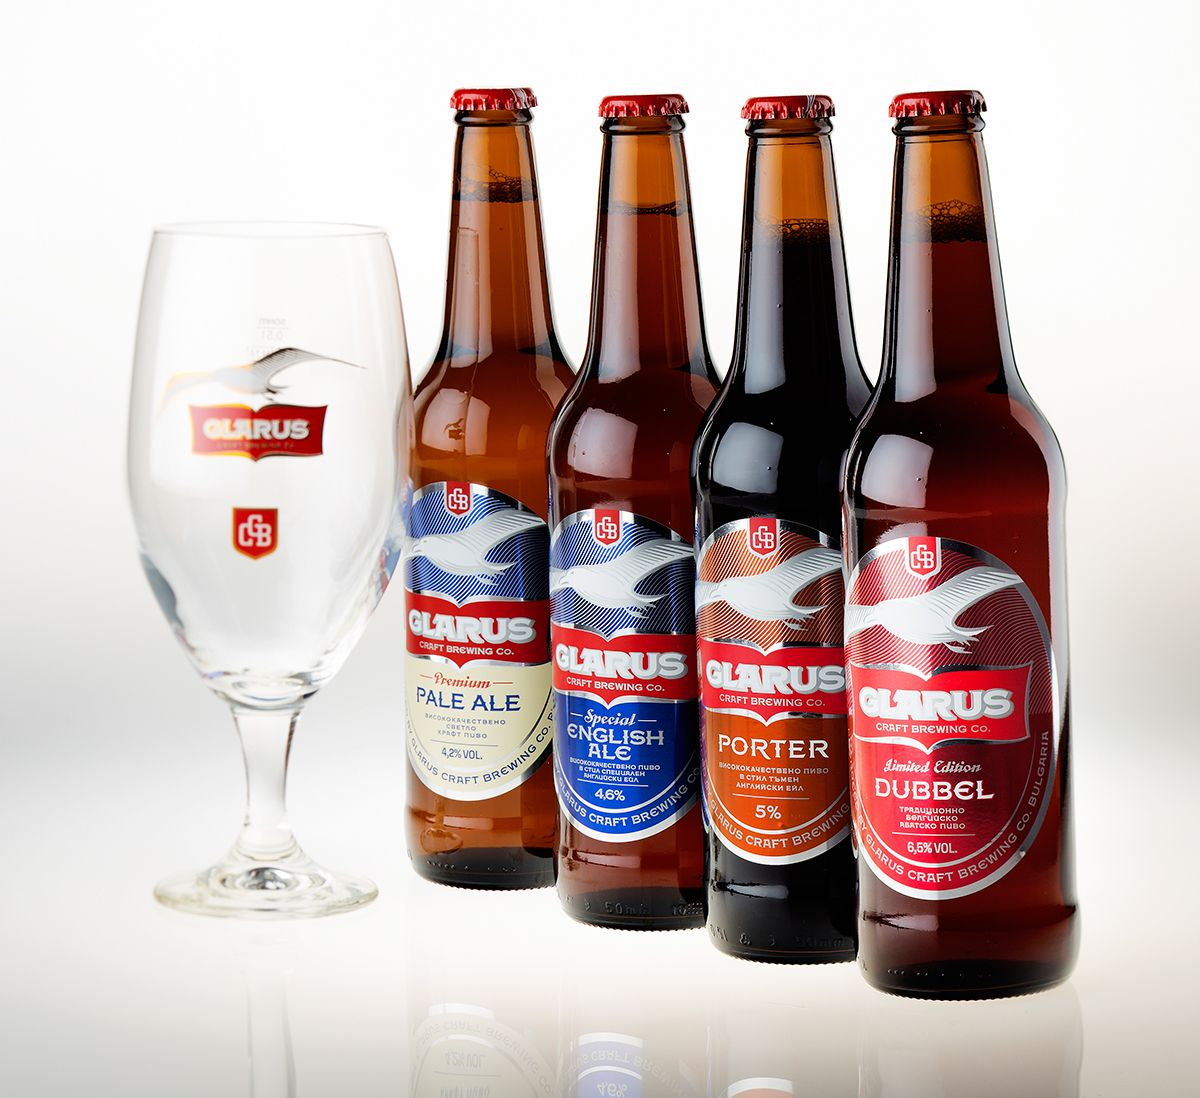 Glarus Beer Label By The Labelmaker On Behance Beer Label Beer Beer Packaging